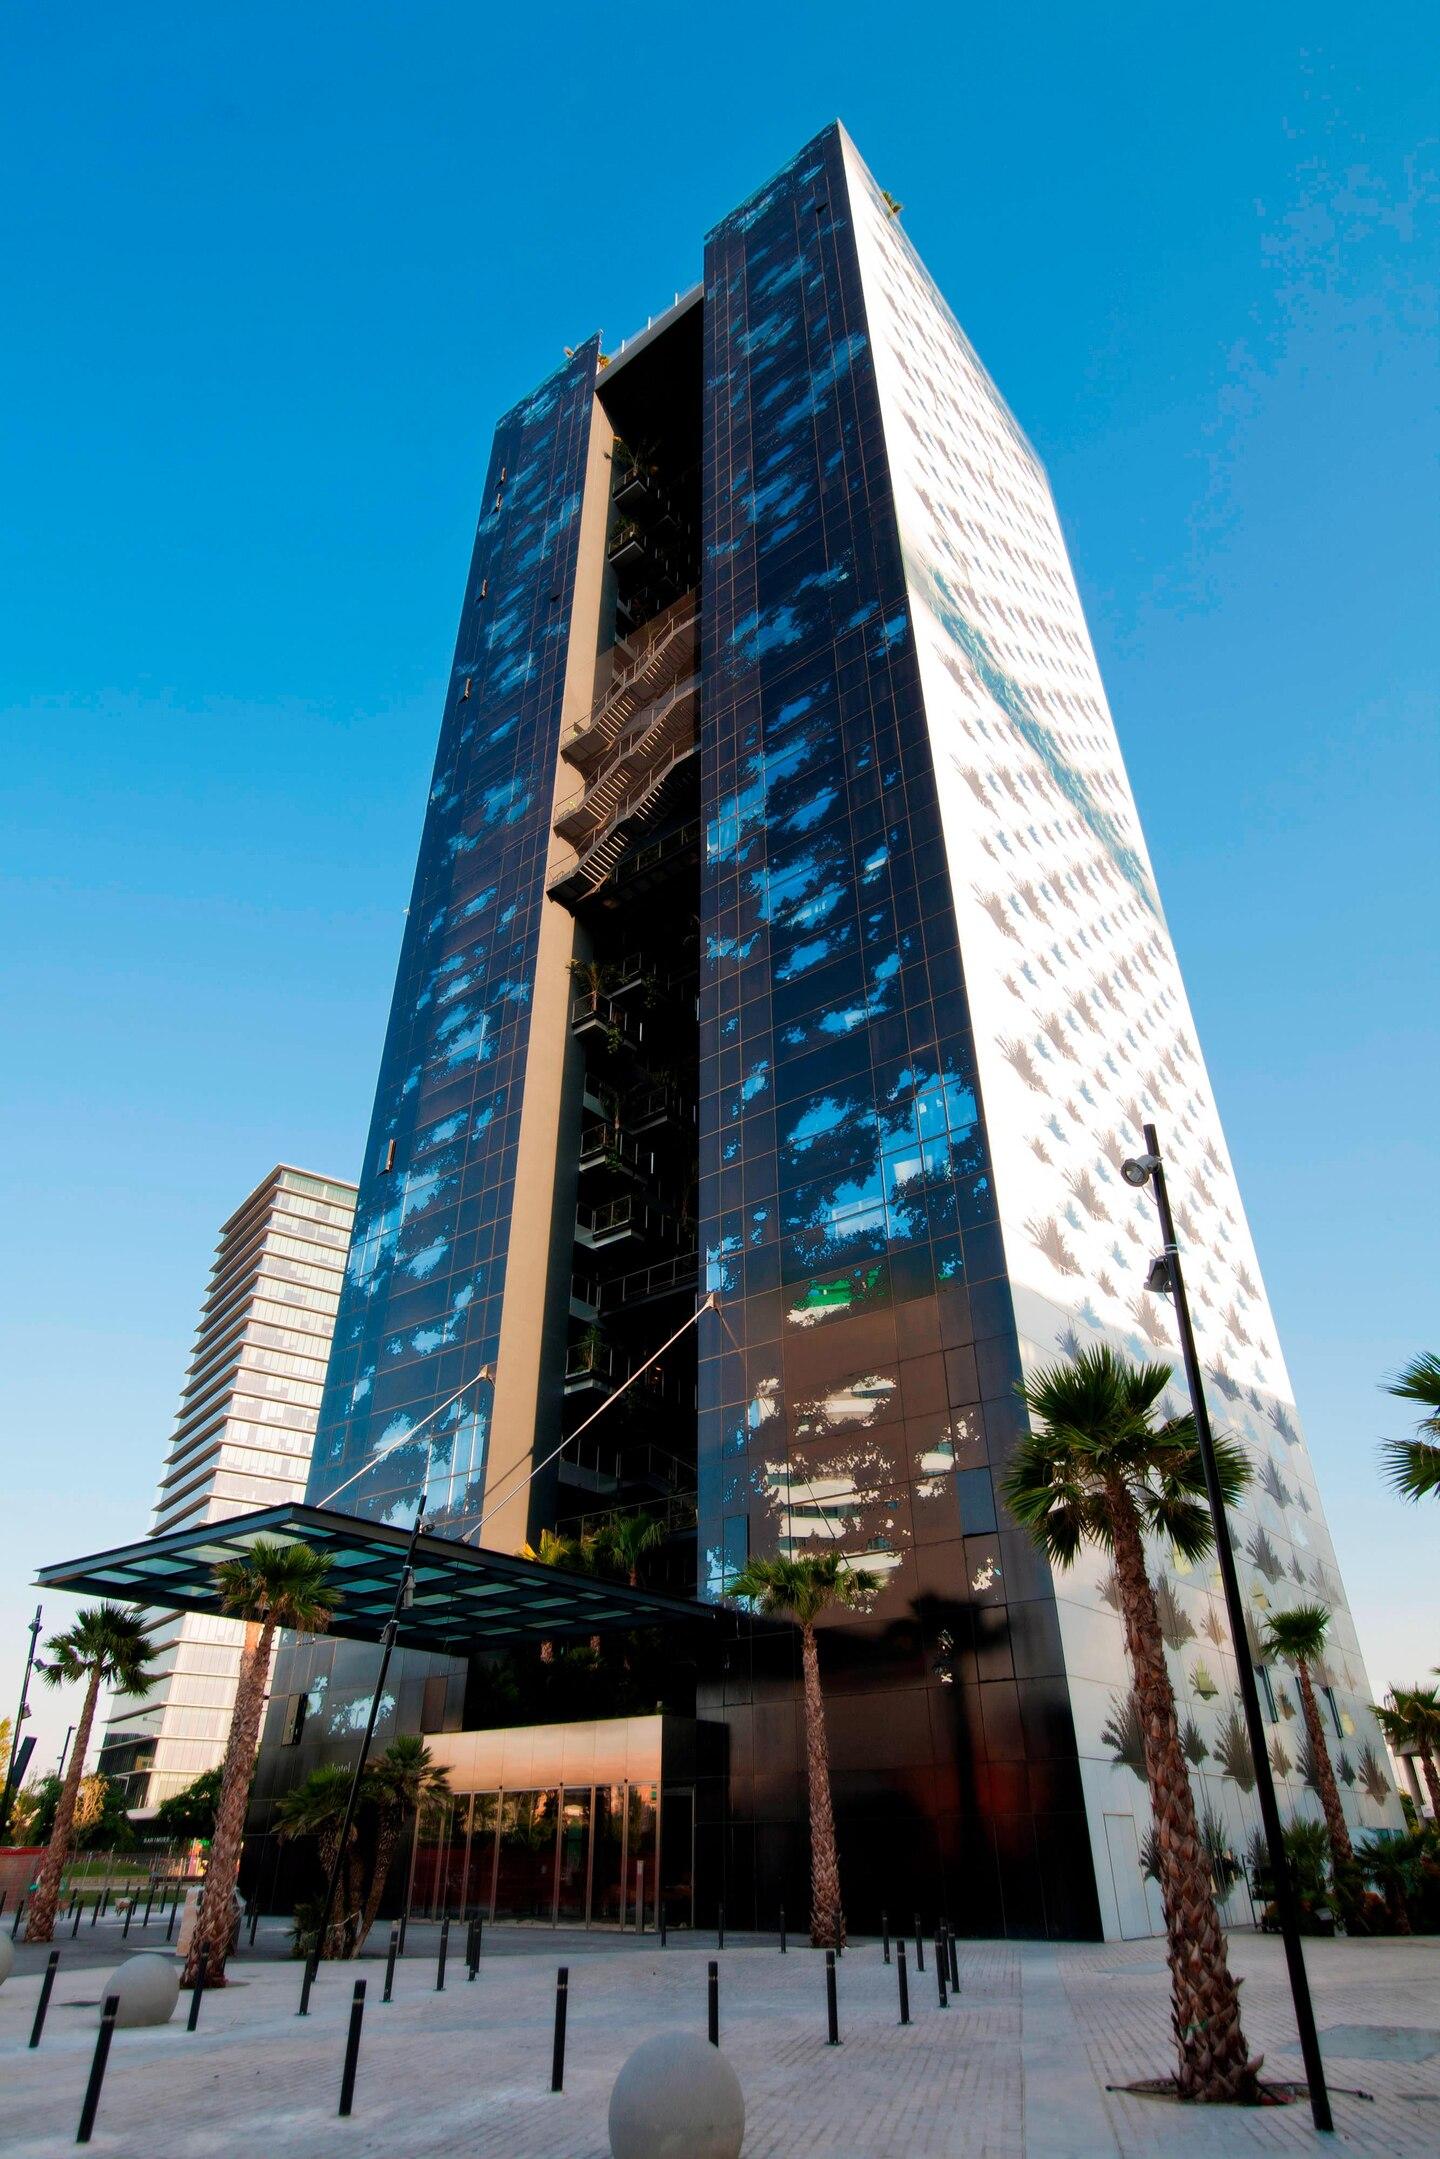 Hotel street view strategically located near the Fira Gran Via convention center